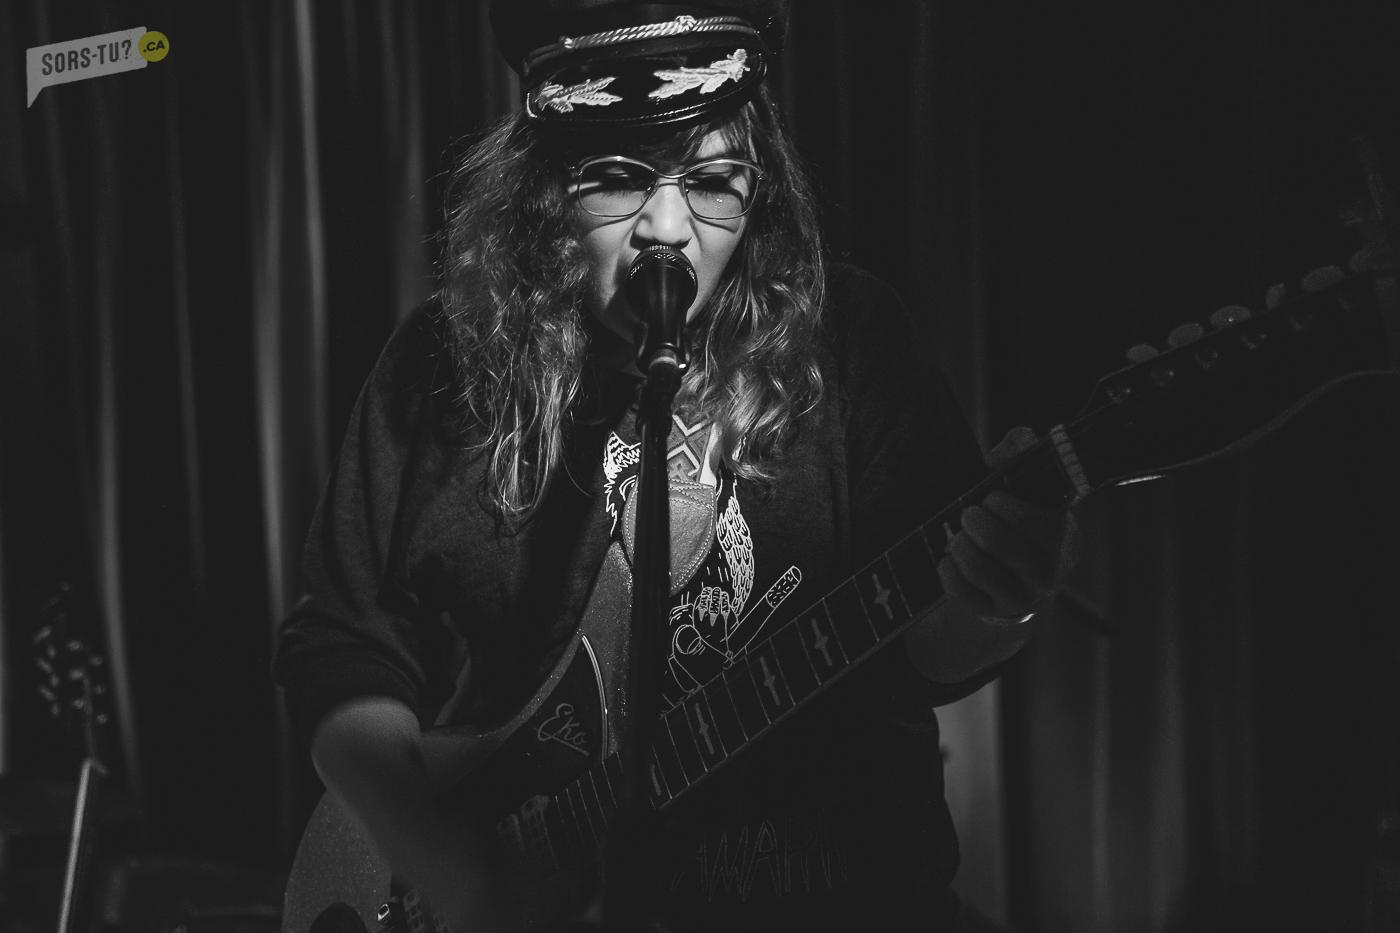 Laura-Sauvage-Taverne-Tour-2017-7214